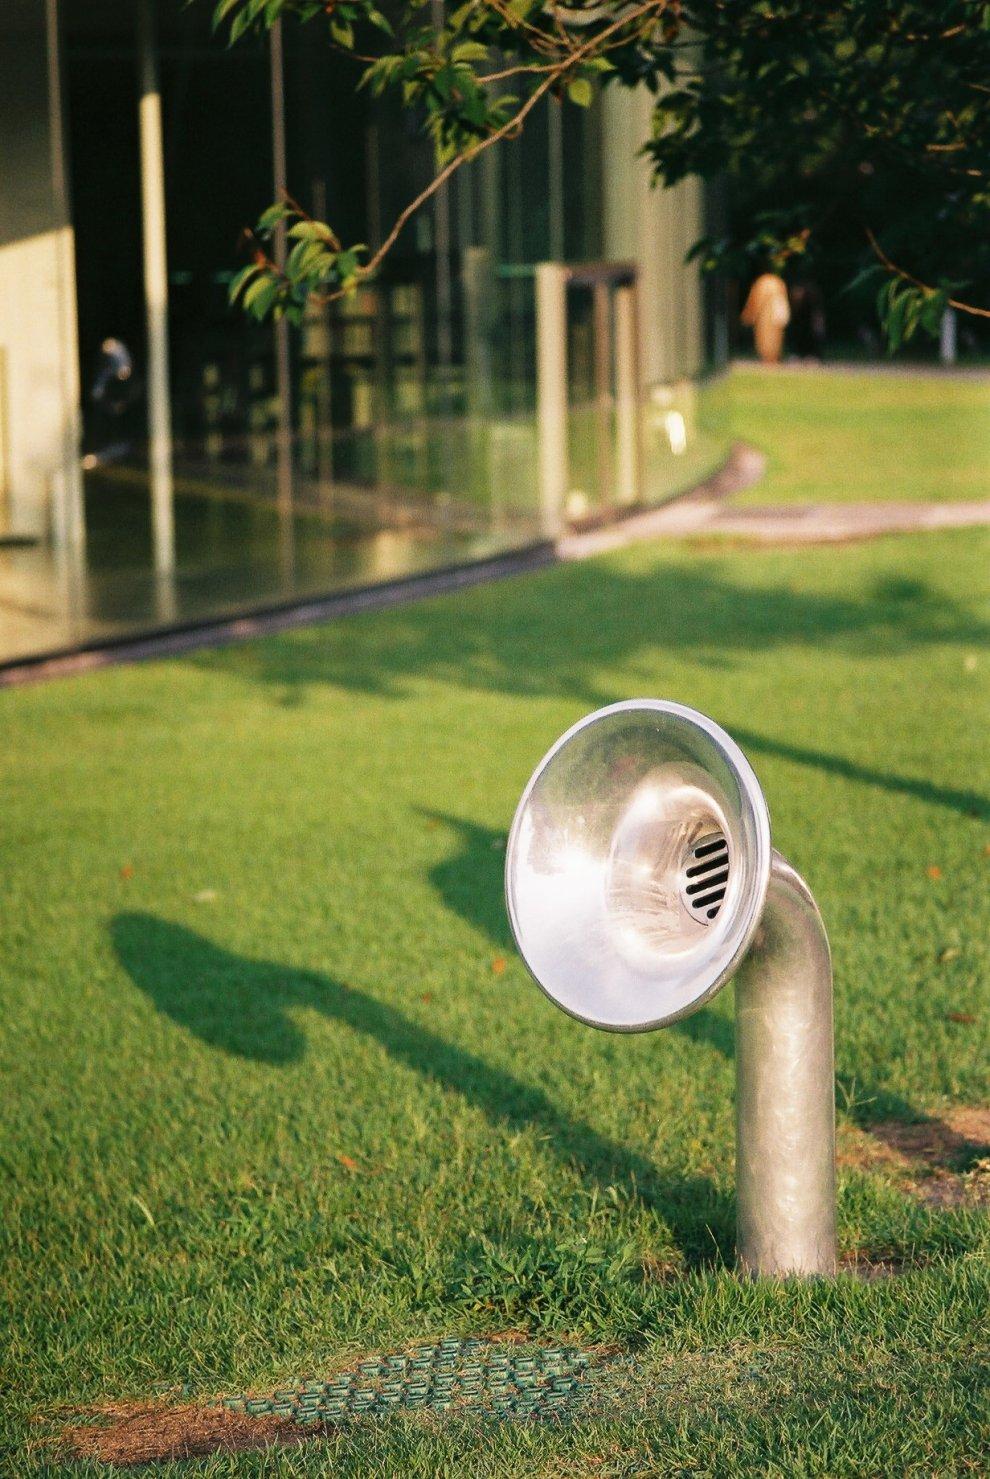 Carl Zeiss Planar T* 45mm F2 (G) 金沢21世紀美術館で撮ったスナップ写真